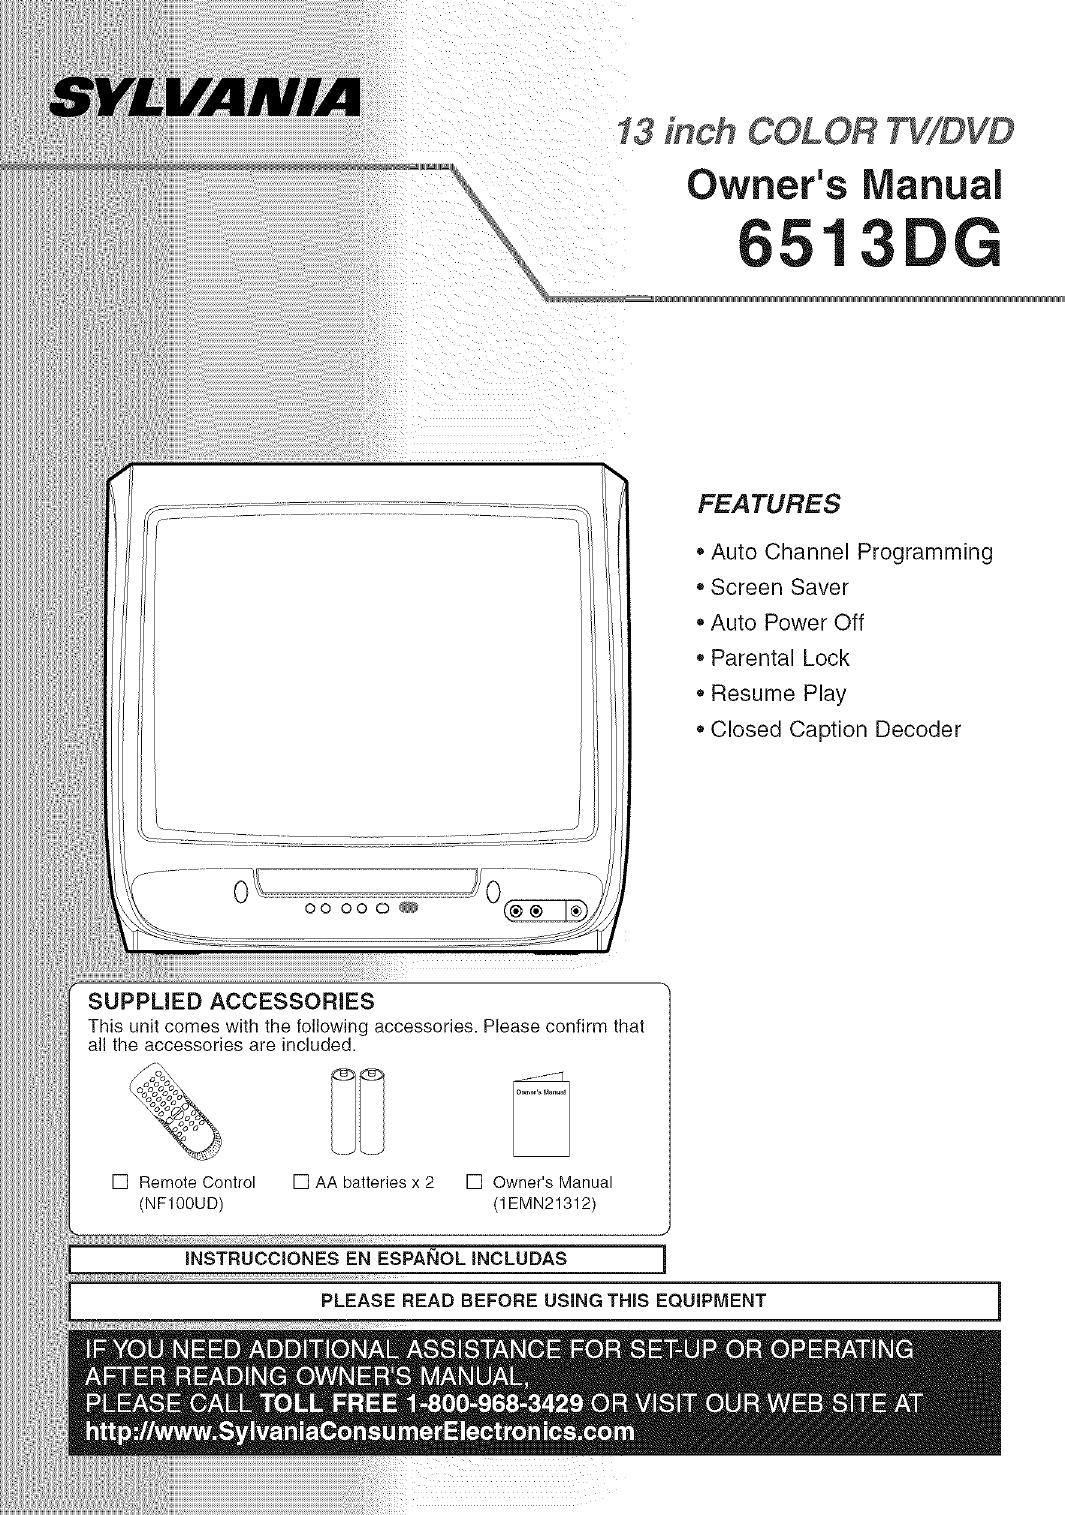 philips digital photo frame instruction manual